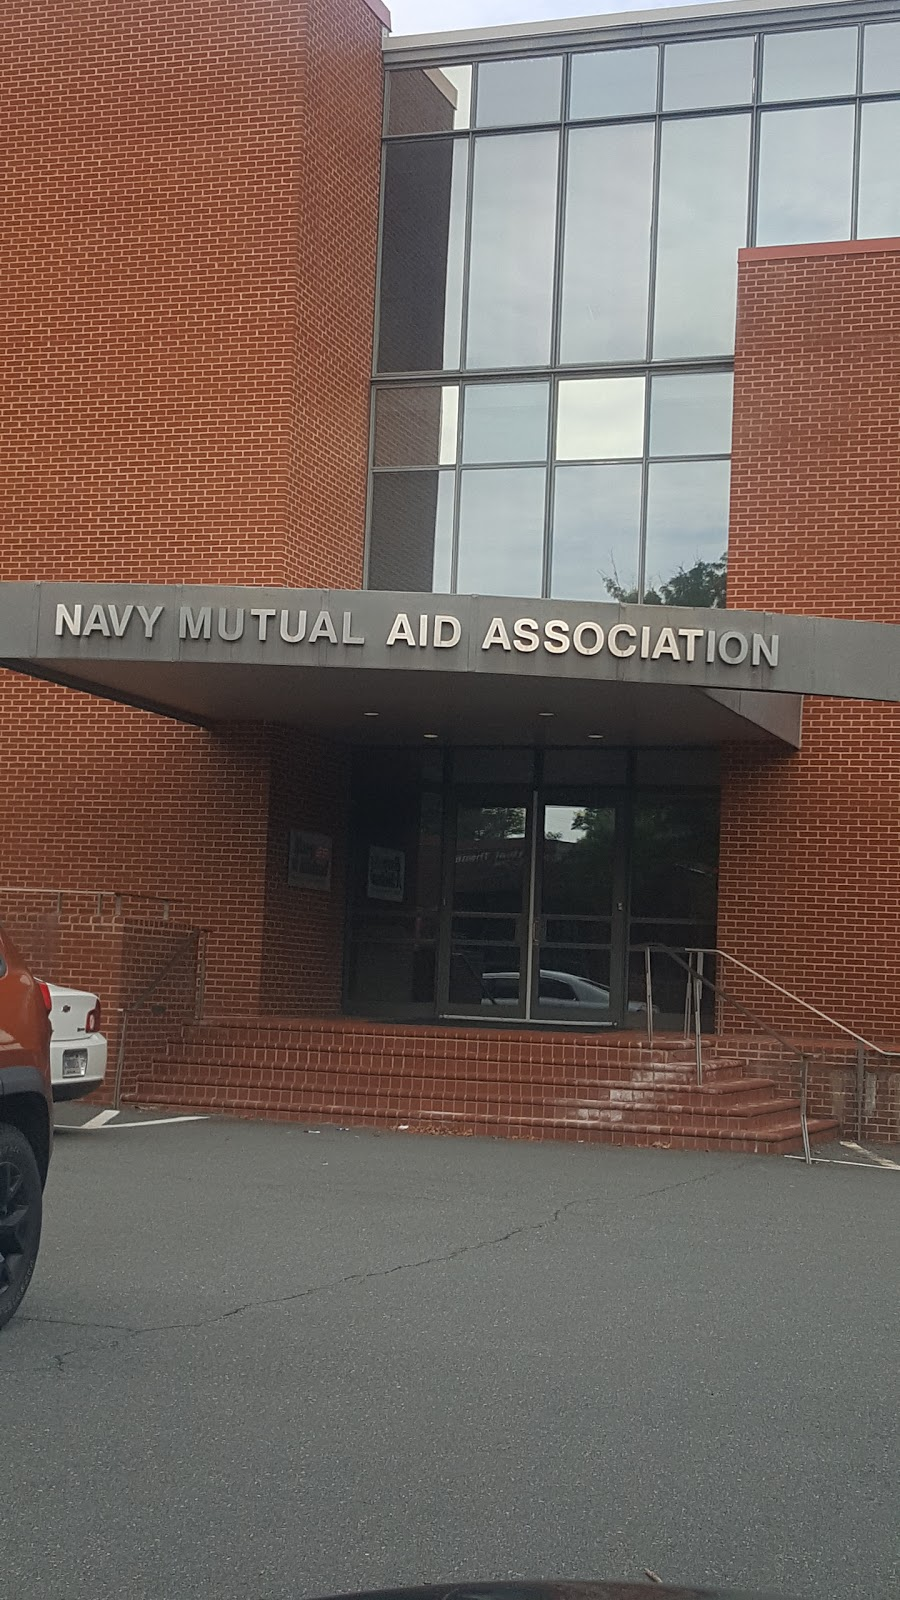 Navy Mutual Aid Association | insurance agency | 29 Carpenter Rd, Arlington, VA 22214, USA | 8006286011 OR +1 800-628-6011